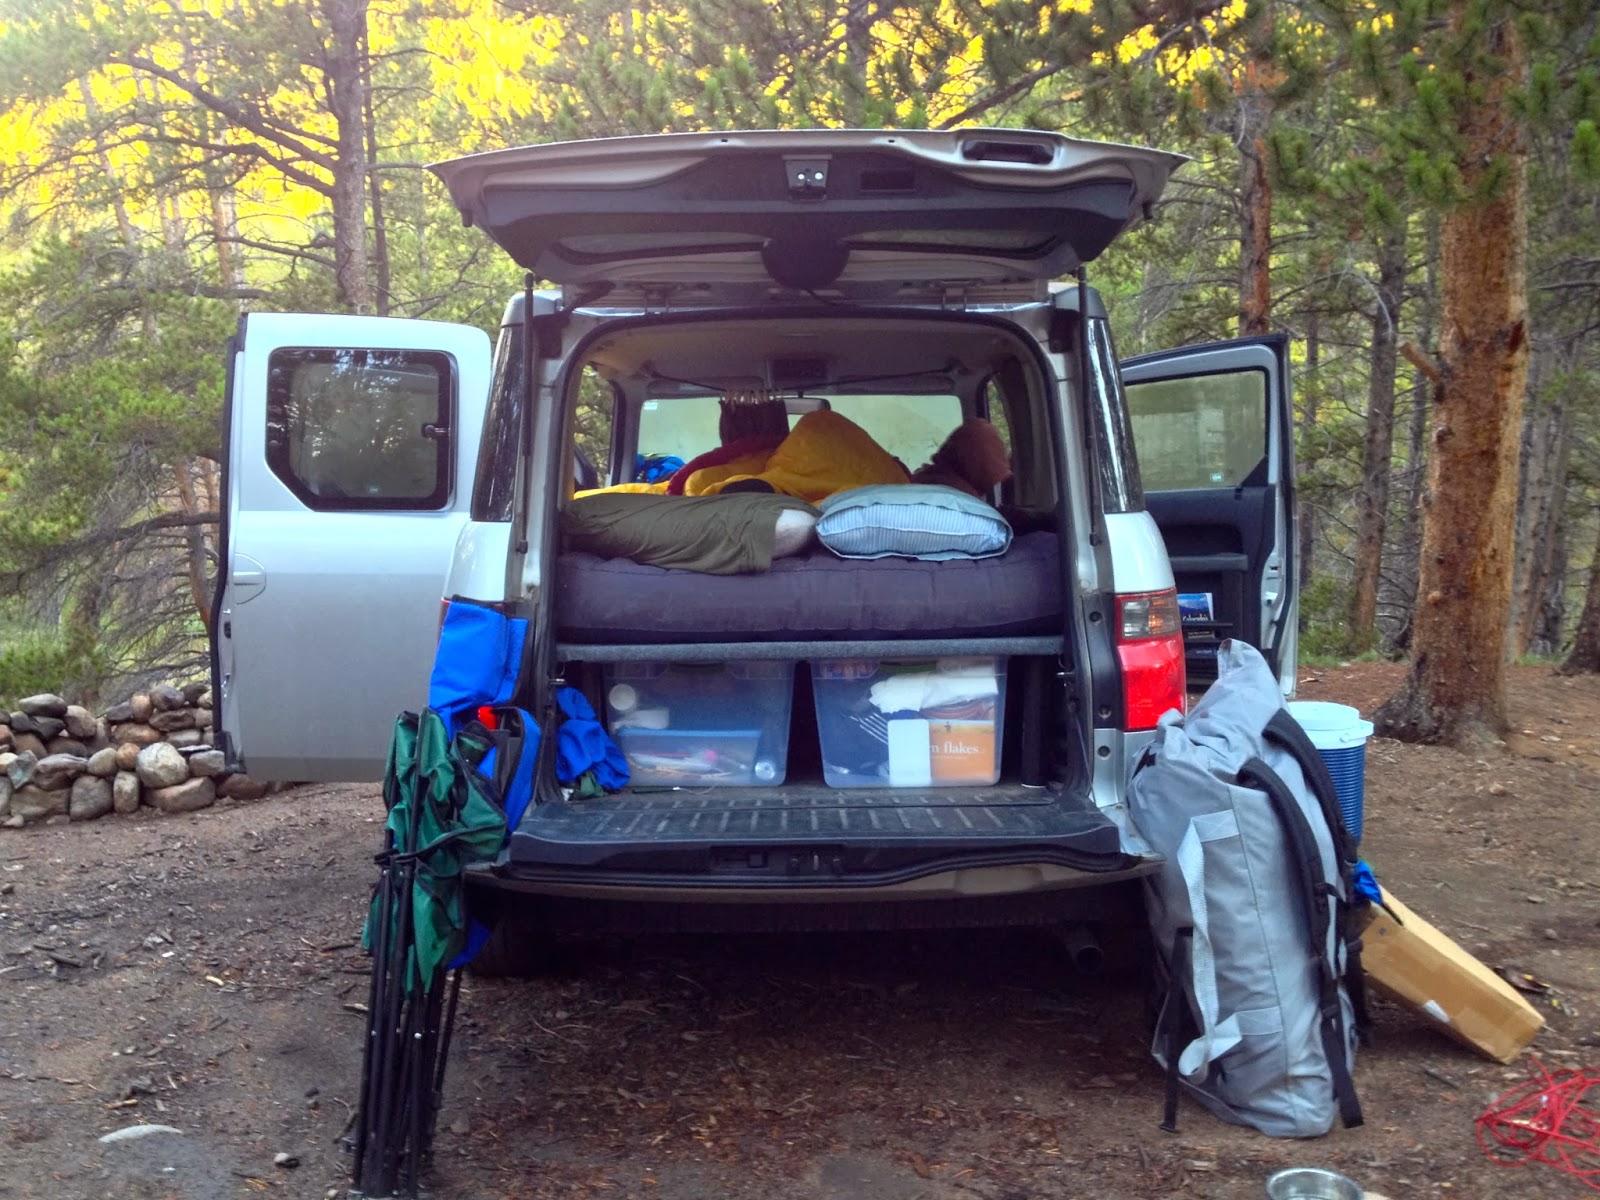 colorado adventures honda element camper platform. Black Bedroom Furniture Sets. Home Design Ideas